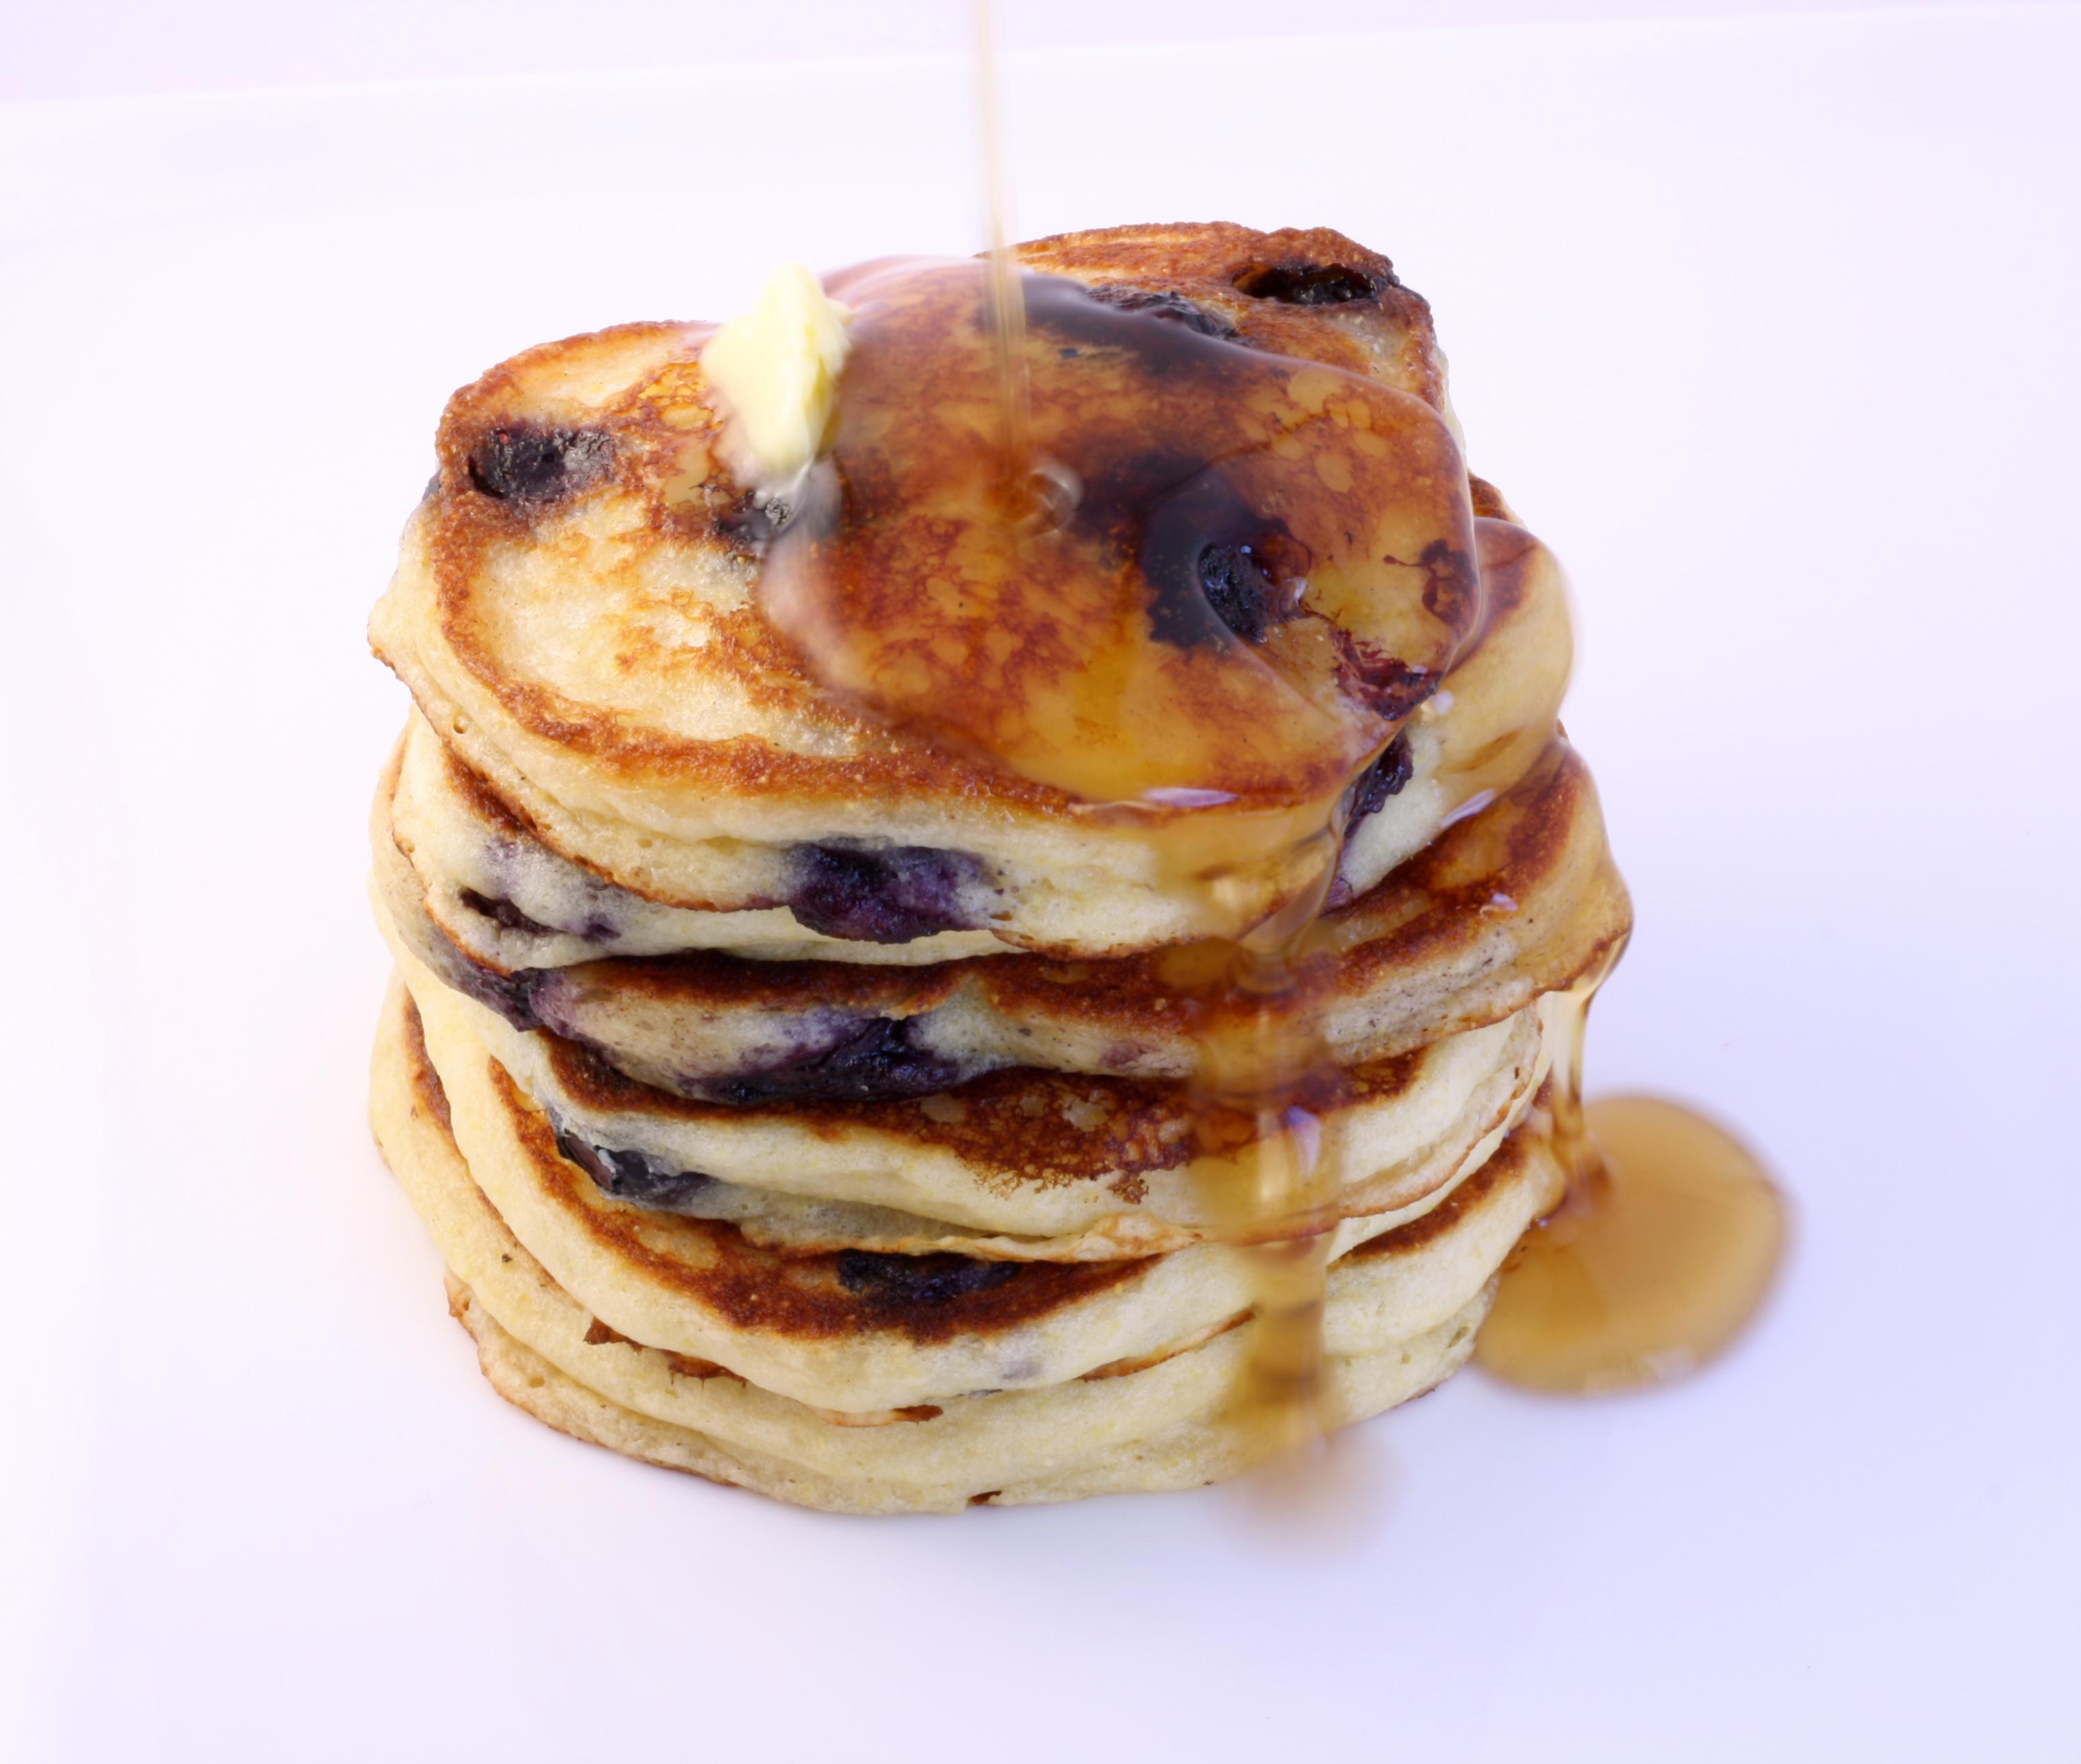 Blueberry Buttermilk Gluten Free Pancakes